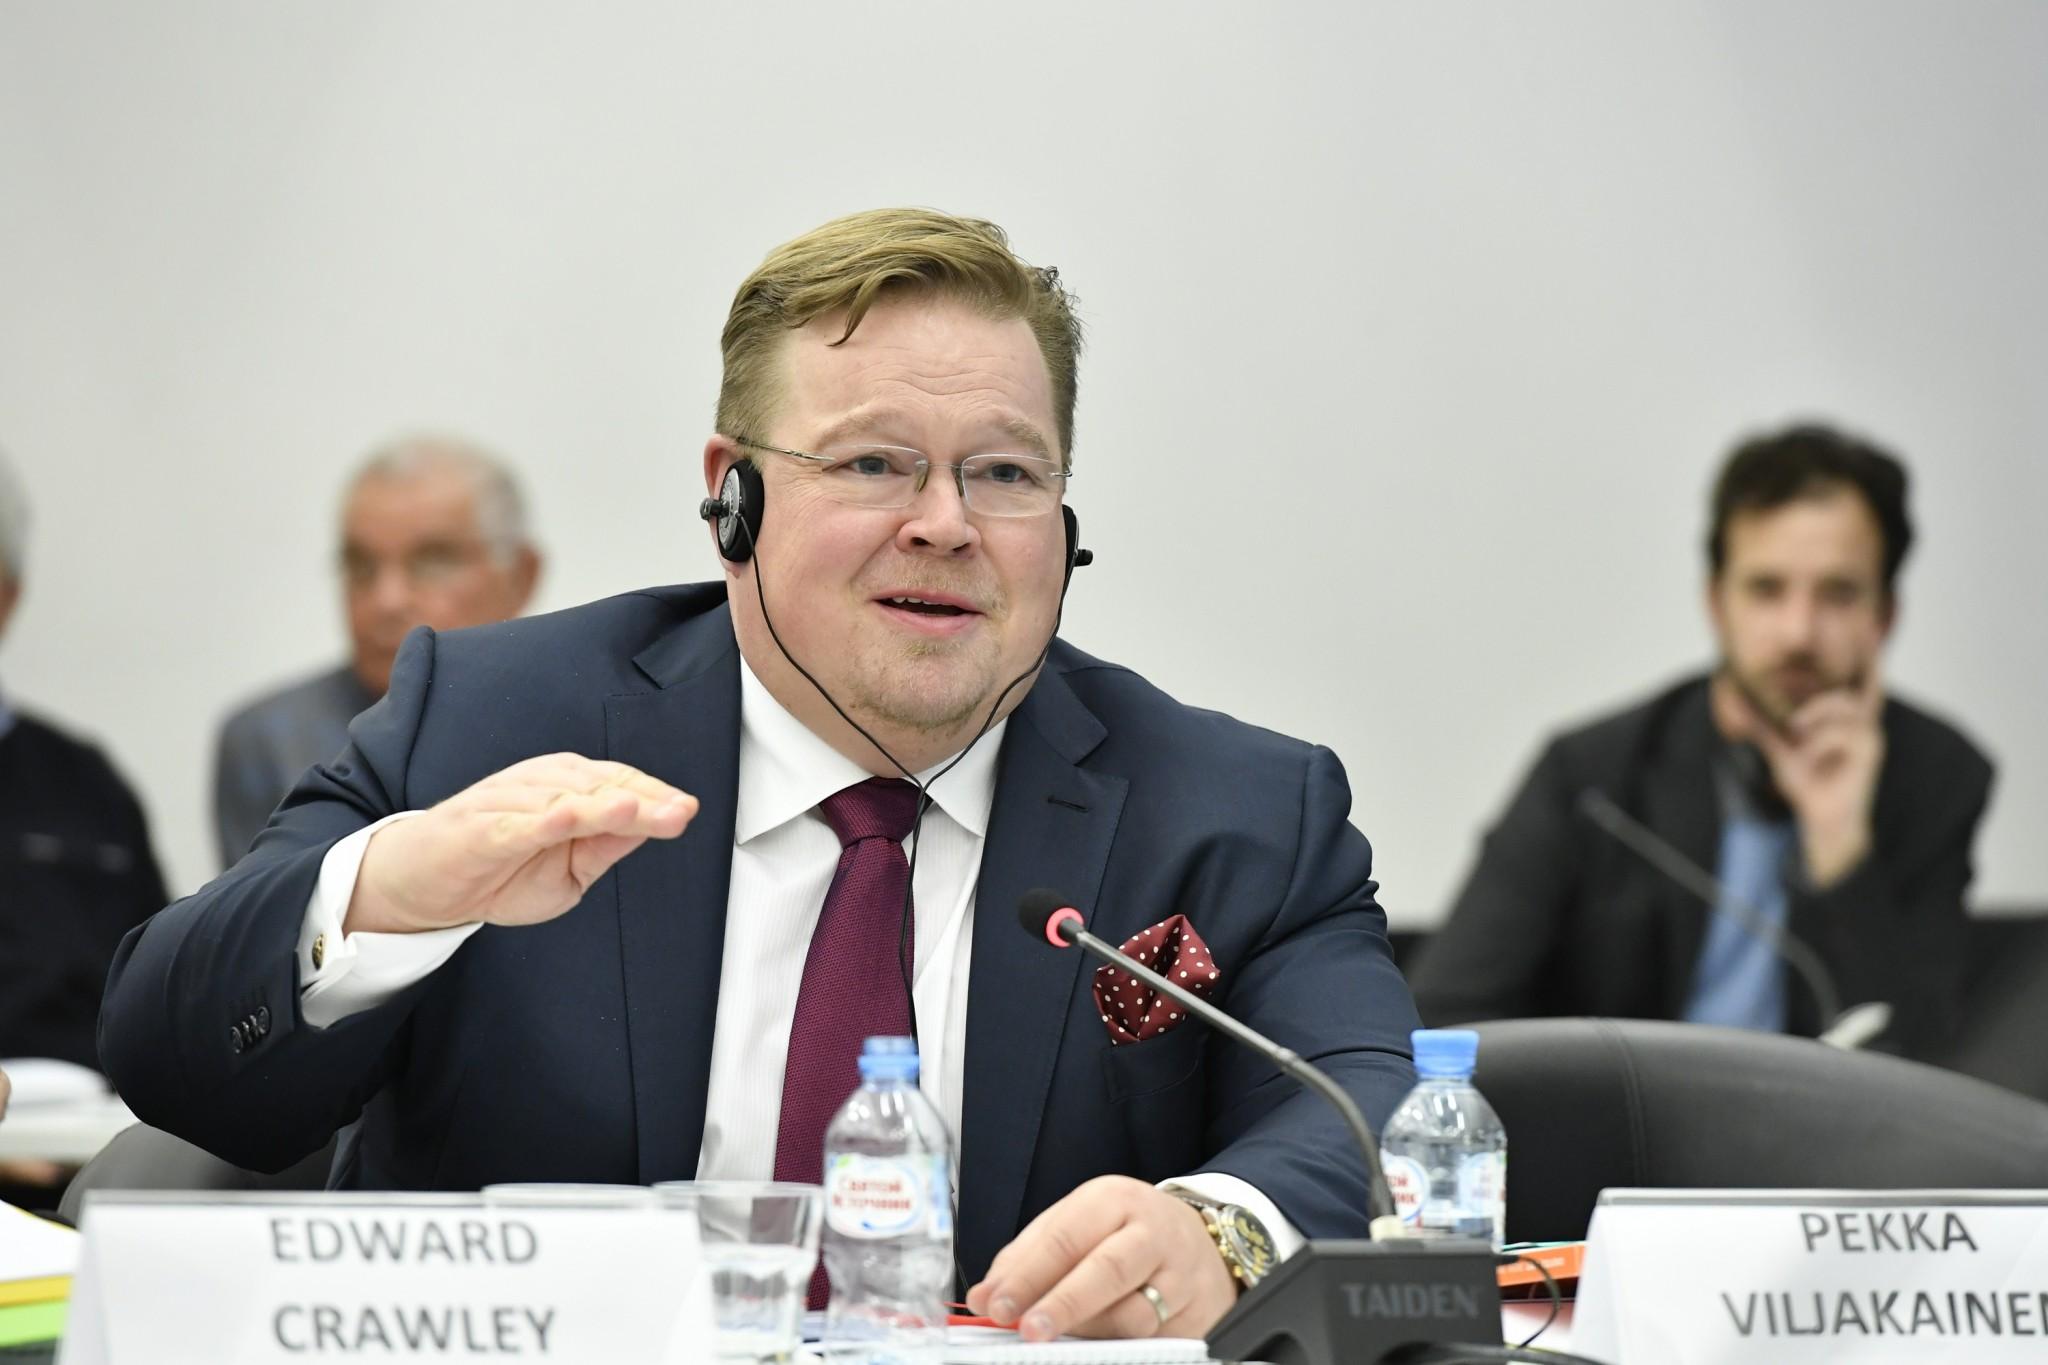 Pekka Viljakainen, Senior Advisor to Skolkovo Foundation President Victor Vekselberg, takes the floor. Photo: Skoltech.